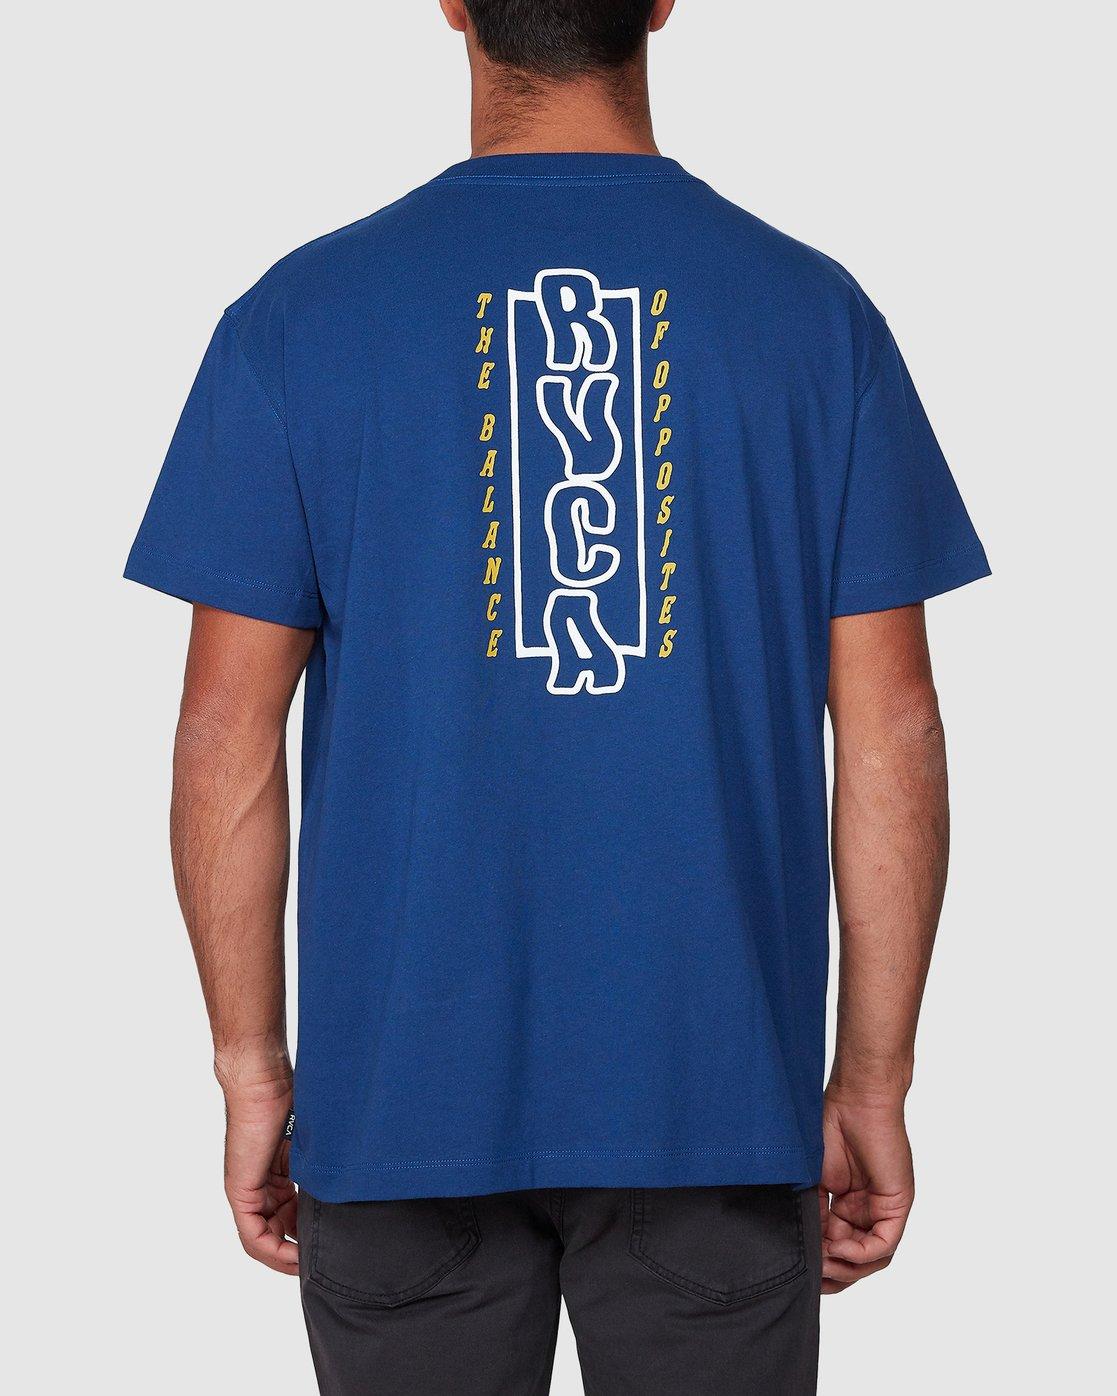 3 Heat Wave Short Sleeve Tee Blue R107047 RVCA